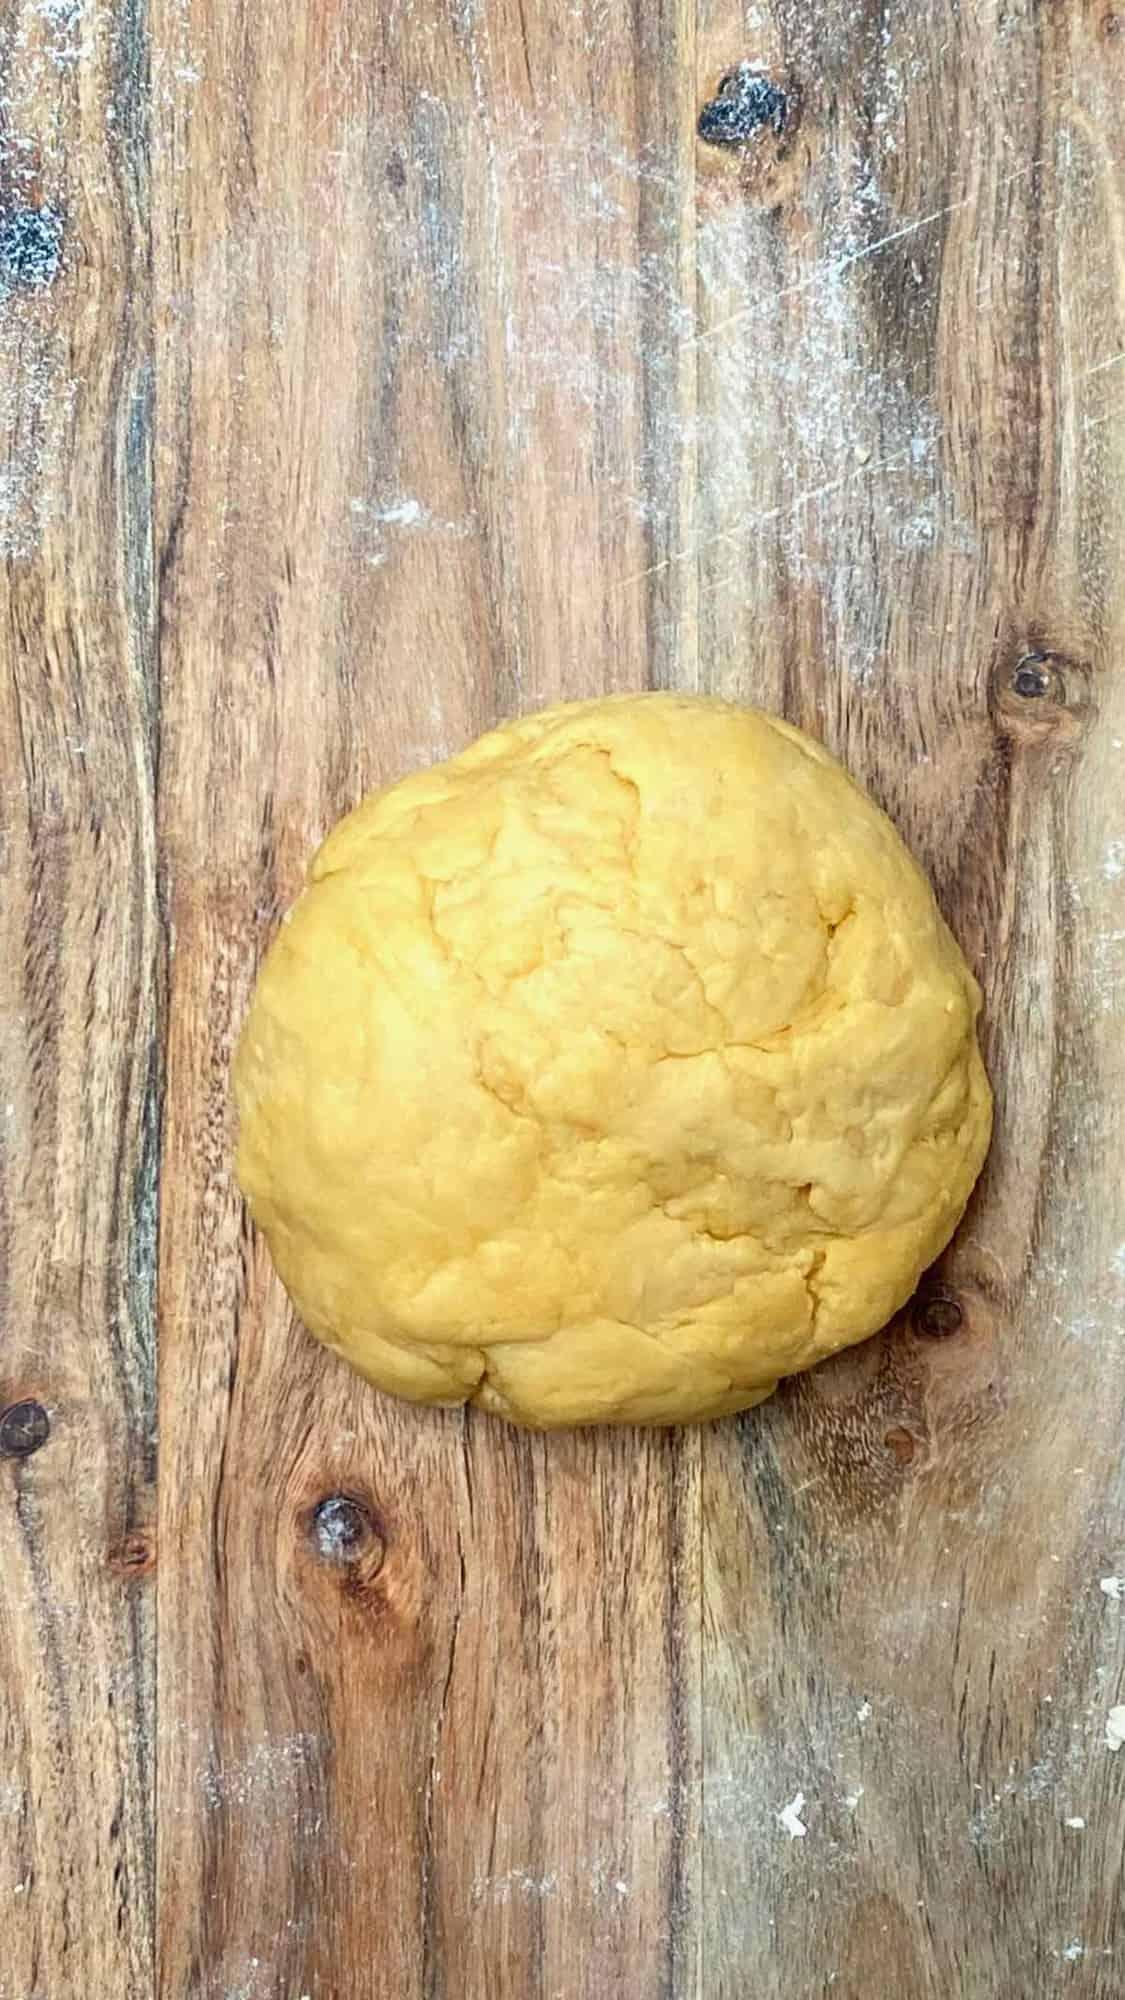 Ravioli dough set aside to rest